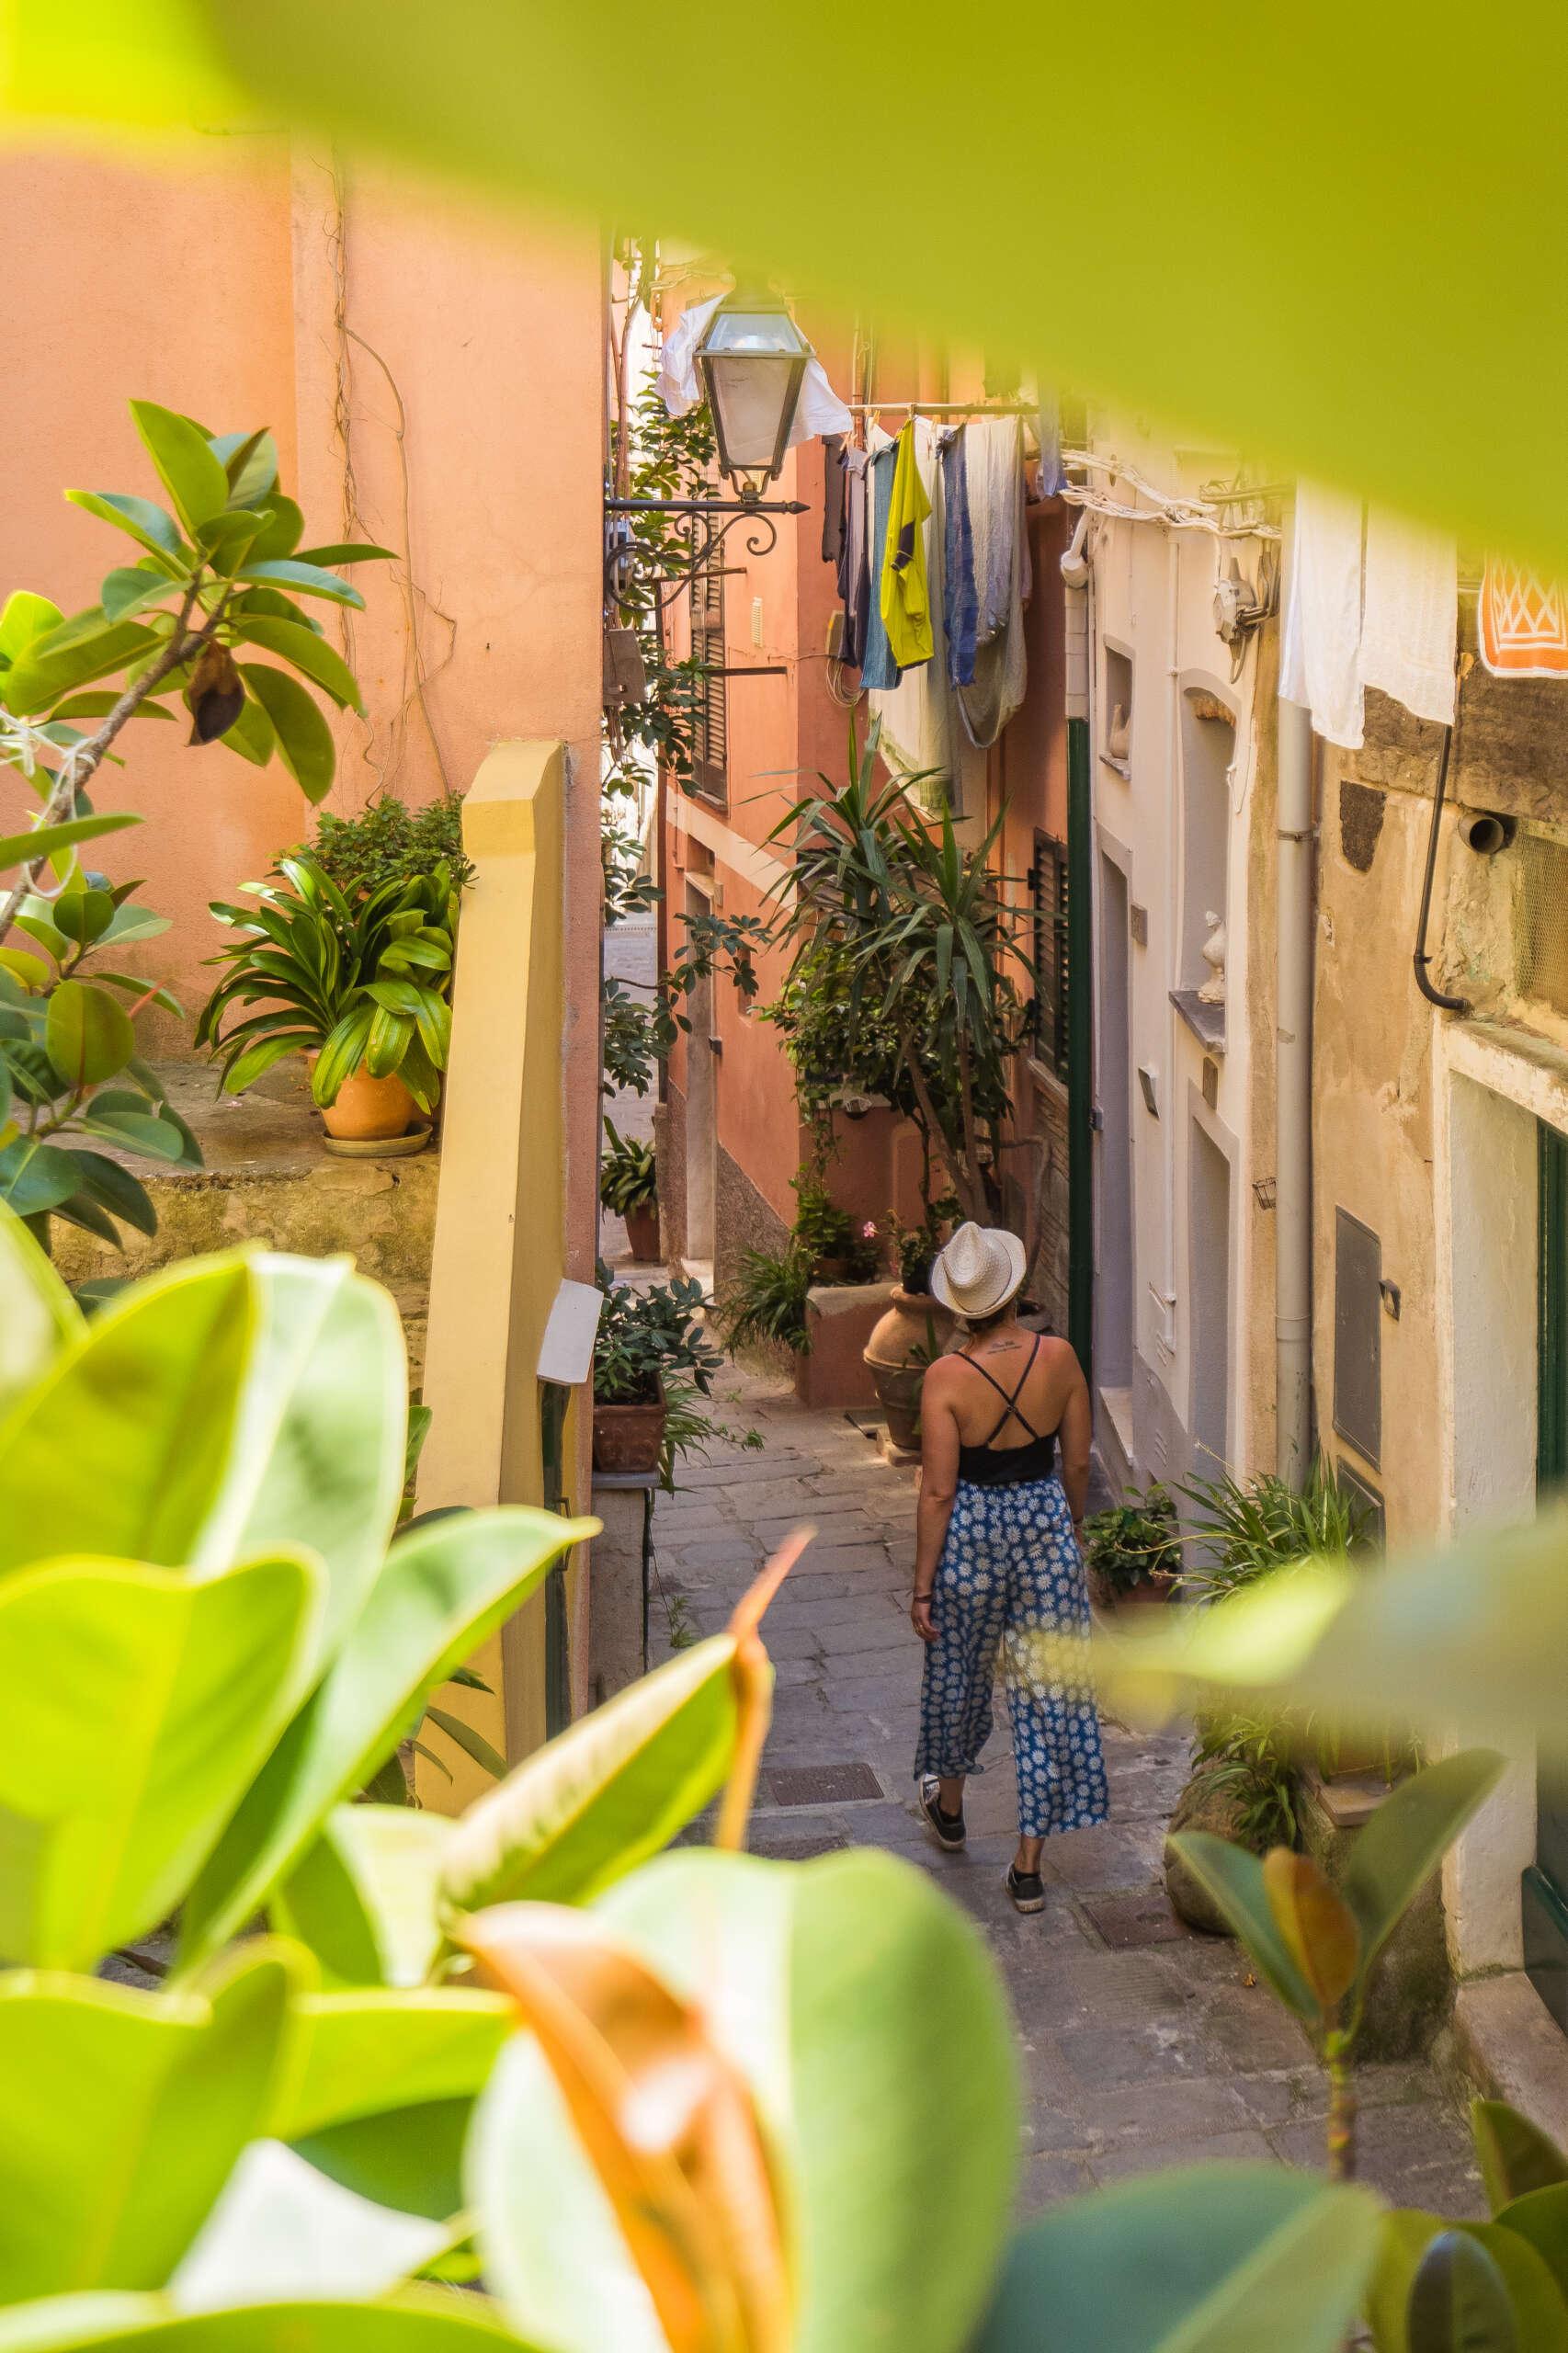 promenade dans le village de vernazza dans les cinque terre